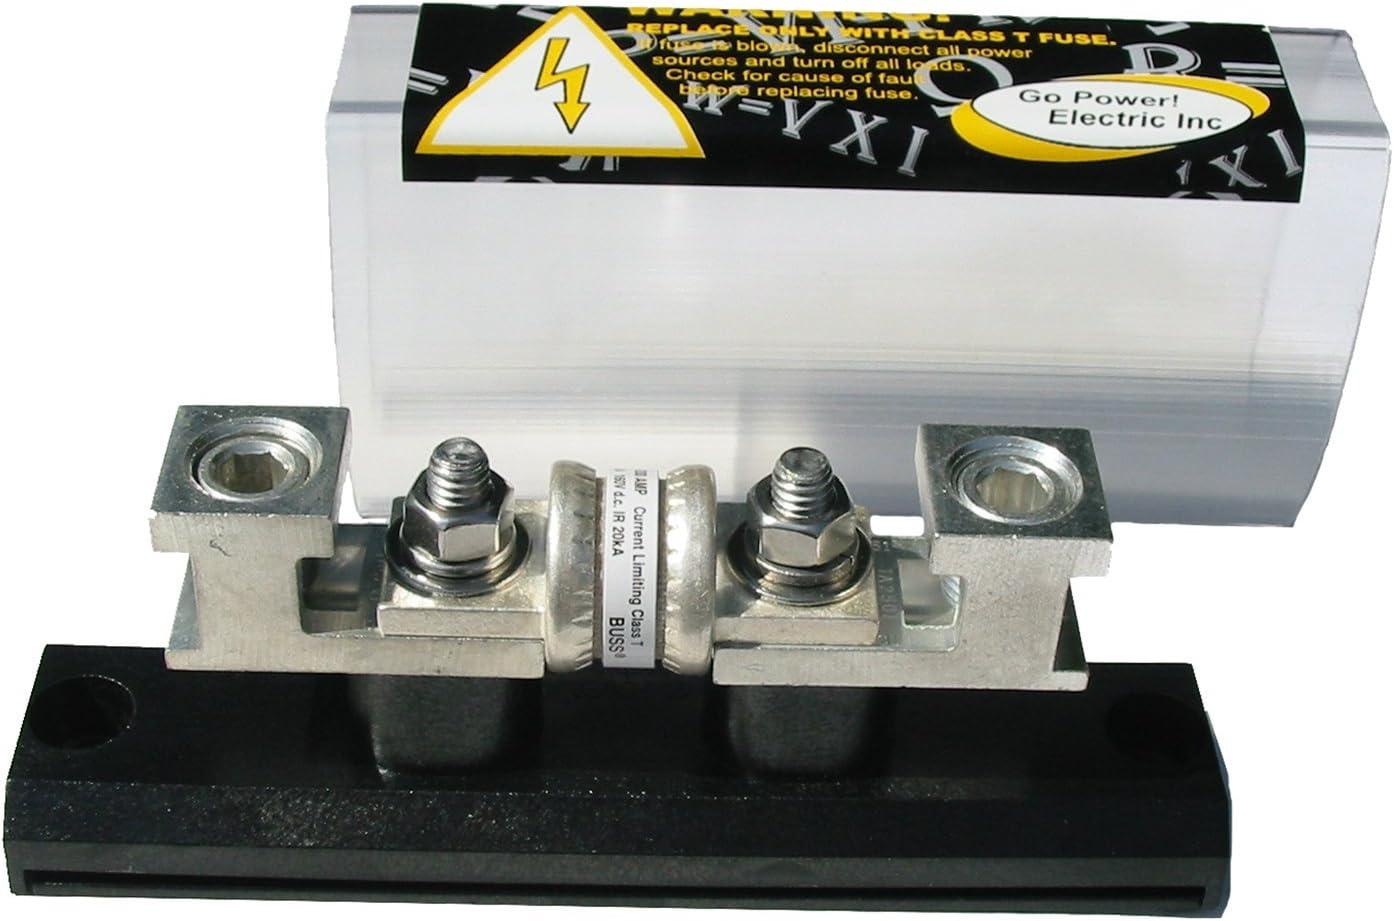 Go Power F-110 Class T 110 Amp Slow Blow Fuse